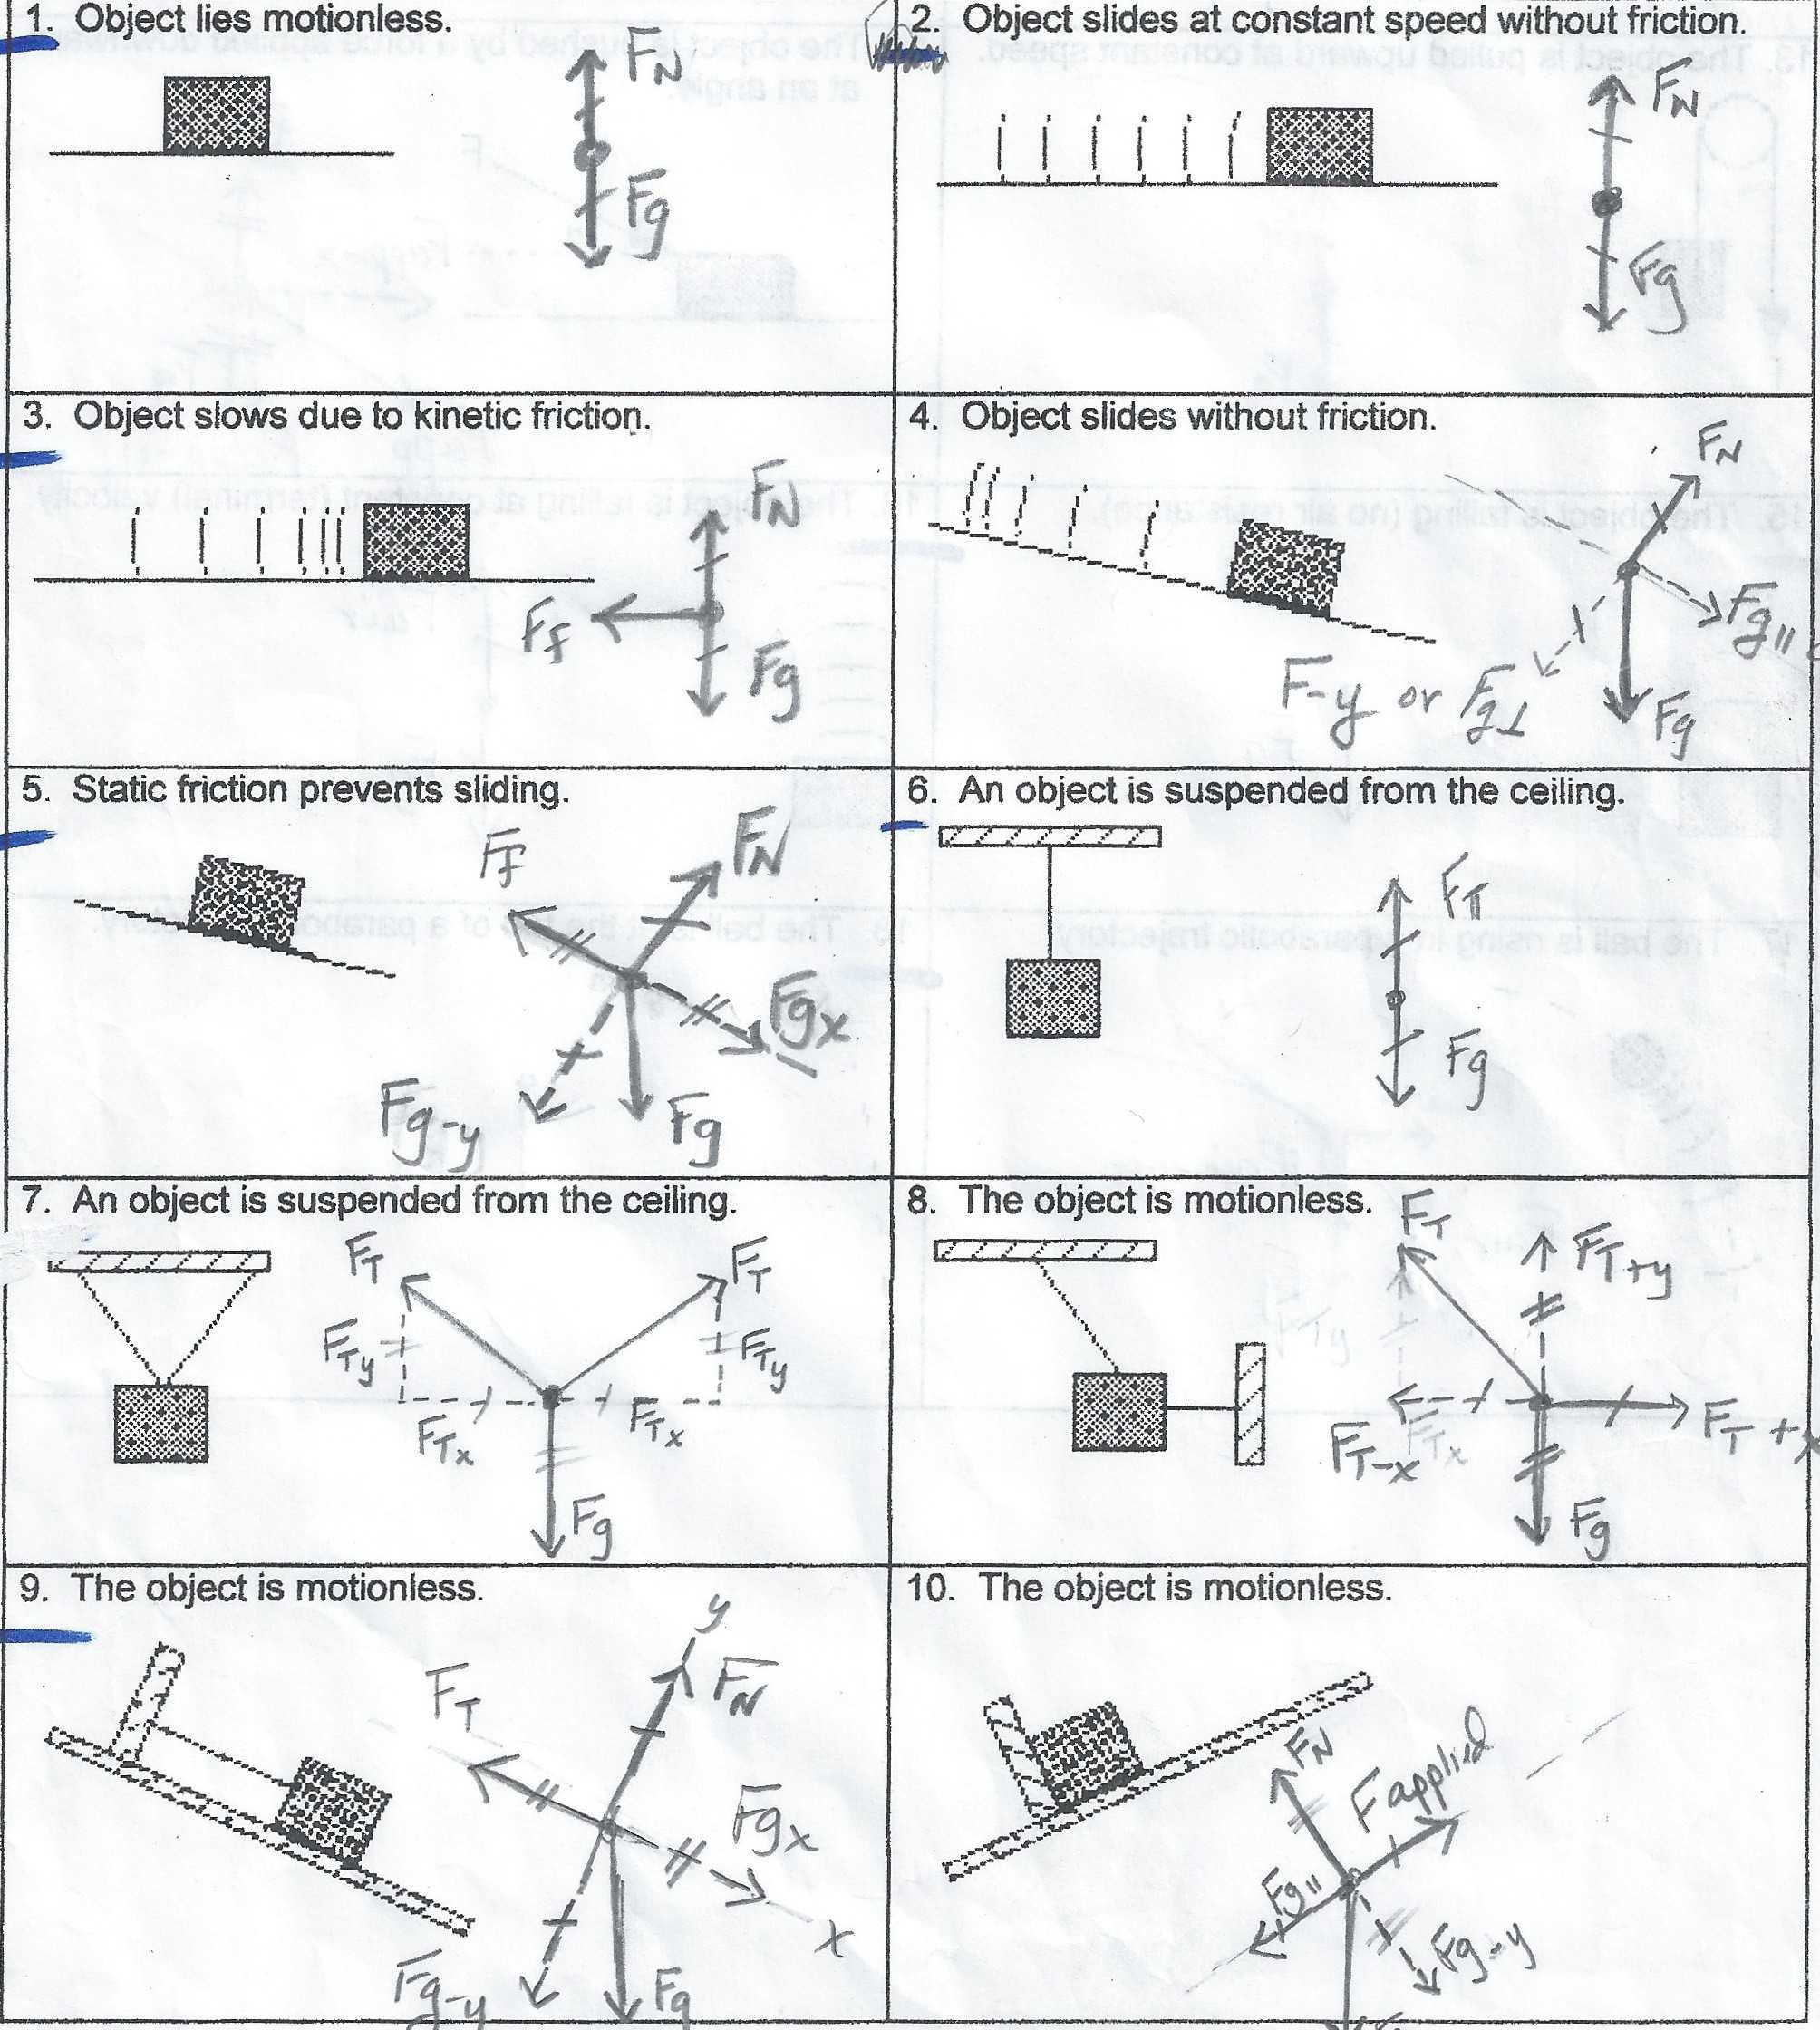 Hr Diagram Worksheet Answers Key